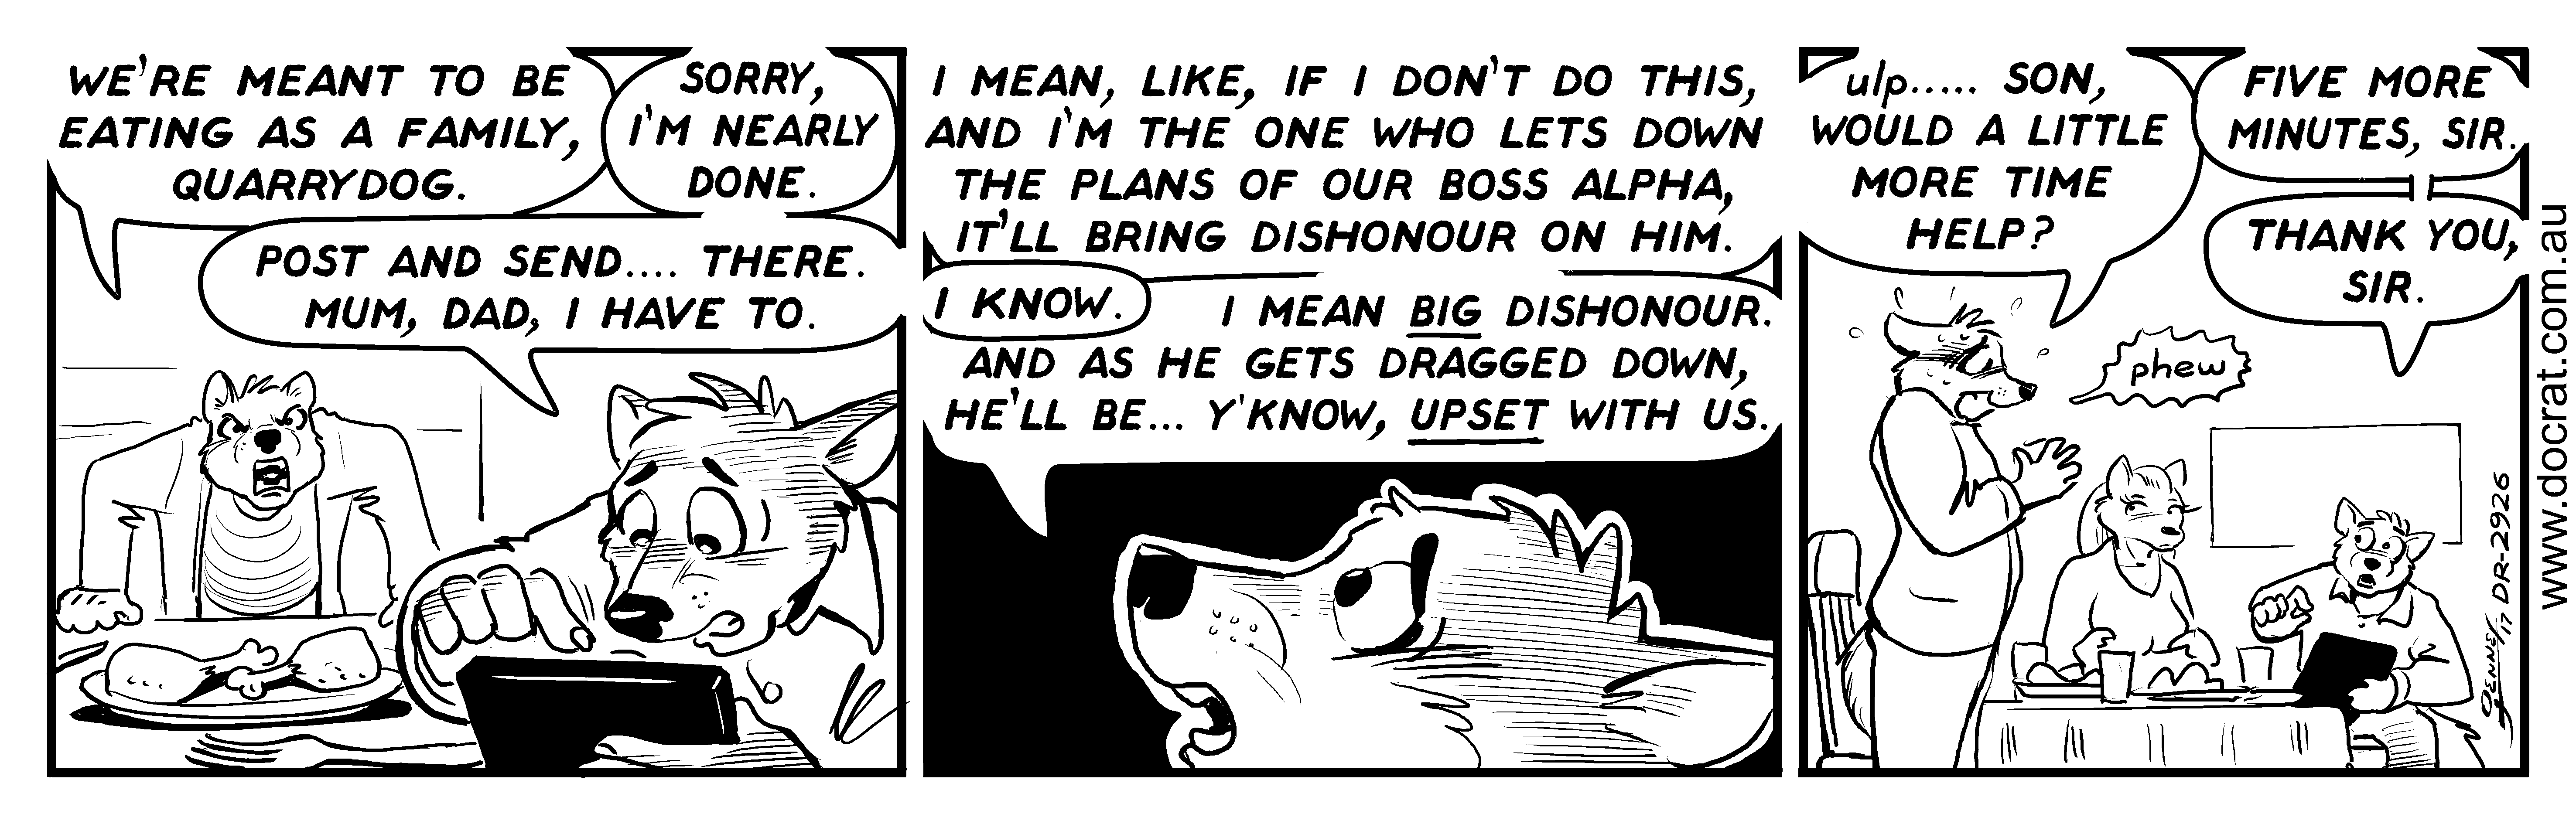 20171211